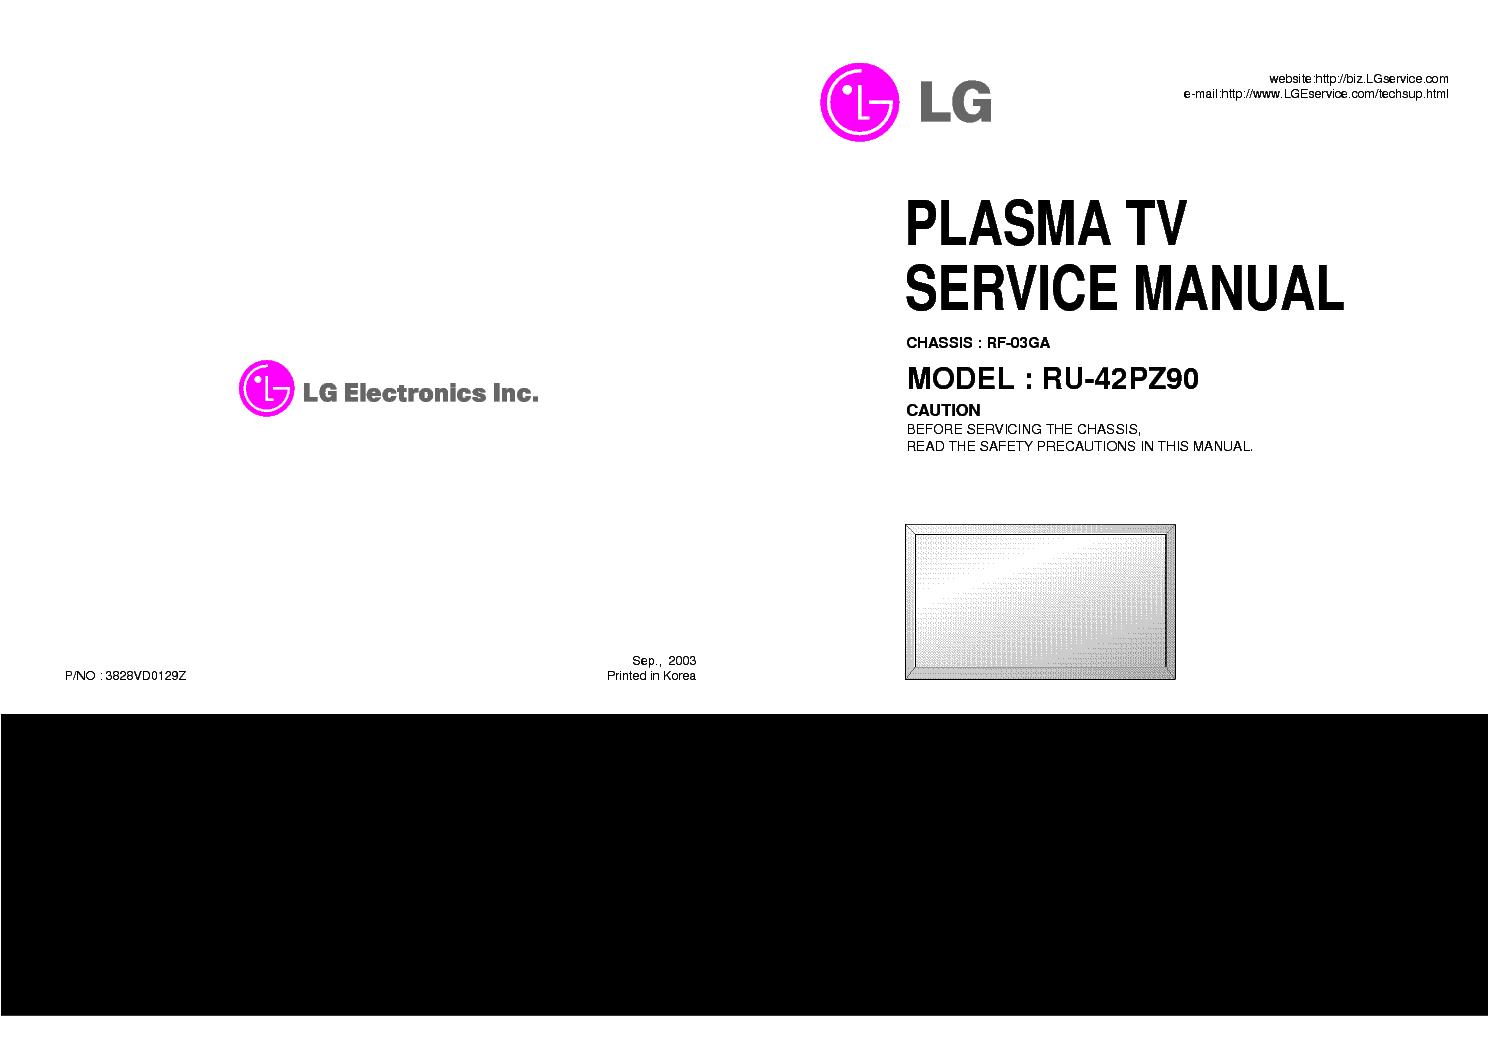 Lg 27ma53d Pz Service Manual And Repair Guide Auto Electrical Samsung Seb 1005r Wiring Diagram Rf03ga Chassis Ru42pz90 Plasmatv